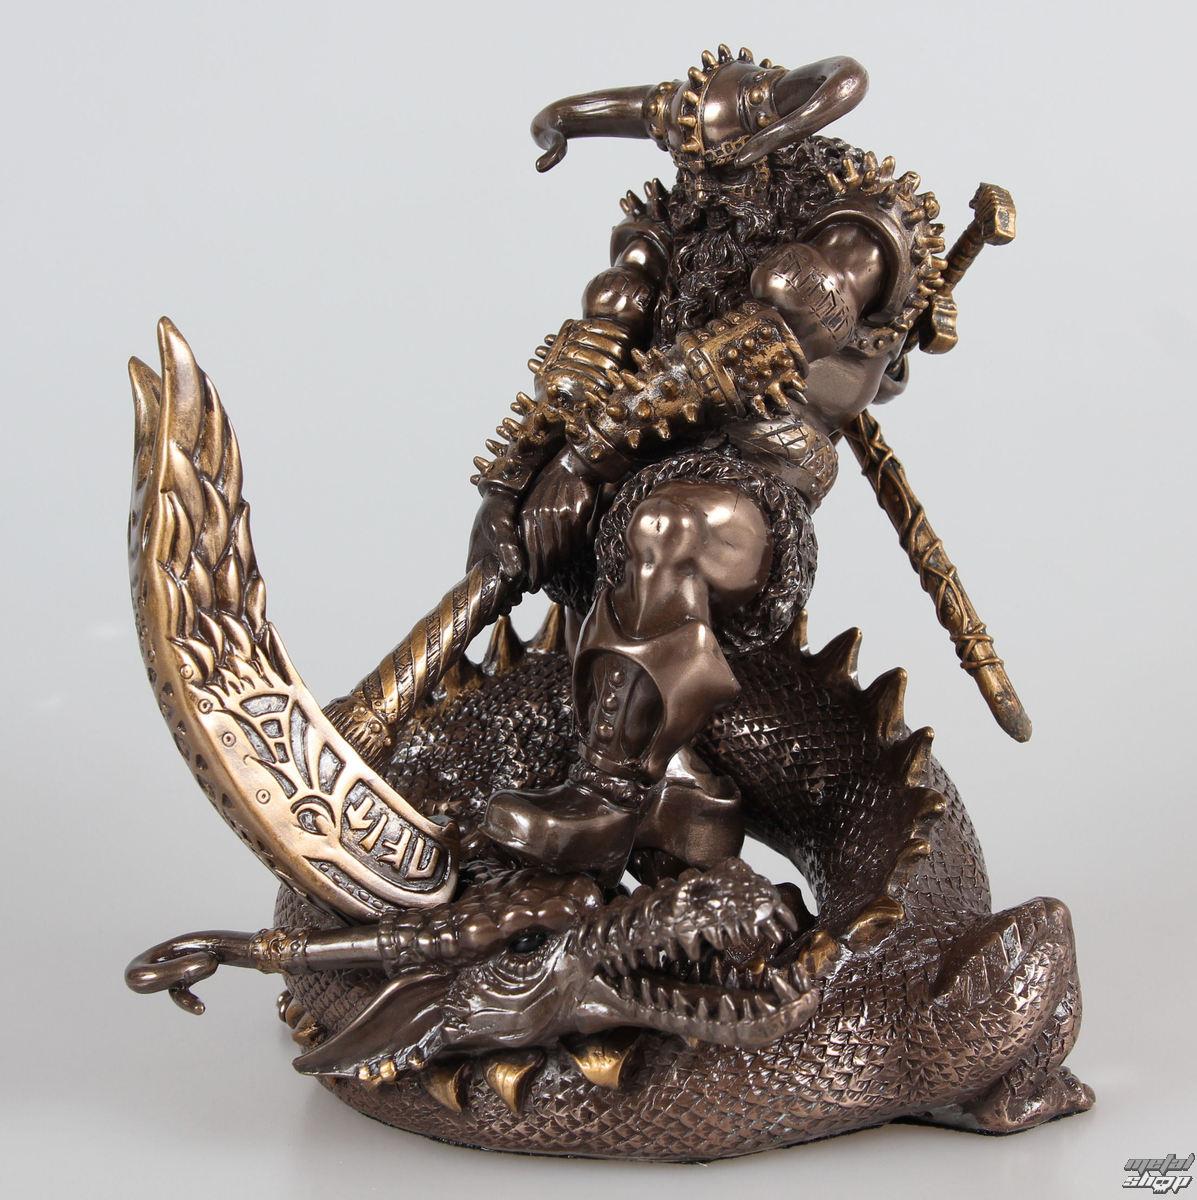 dekorácia Thor Battles the Midgard Serpent - WH10049